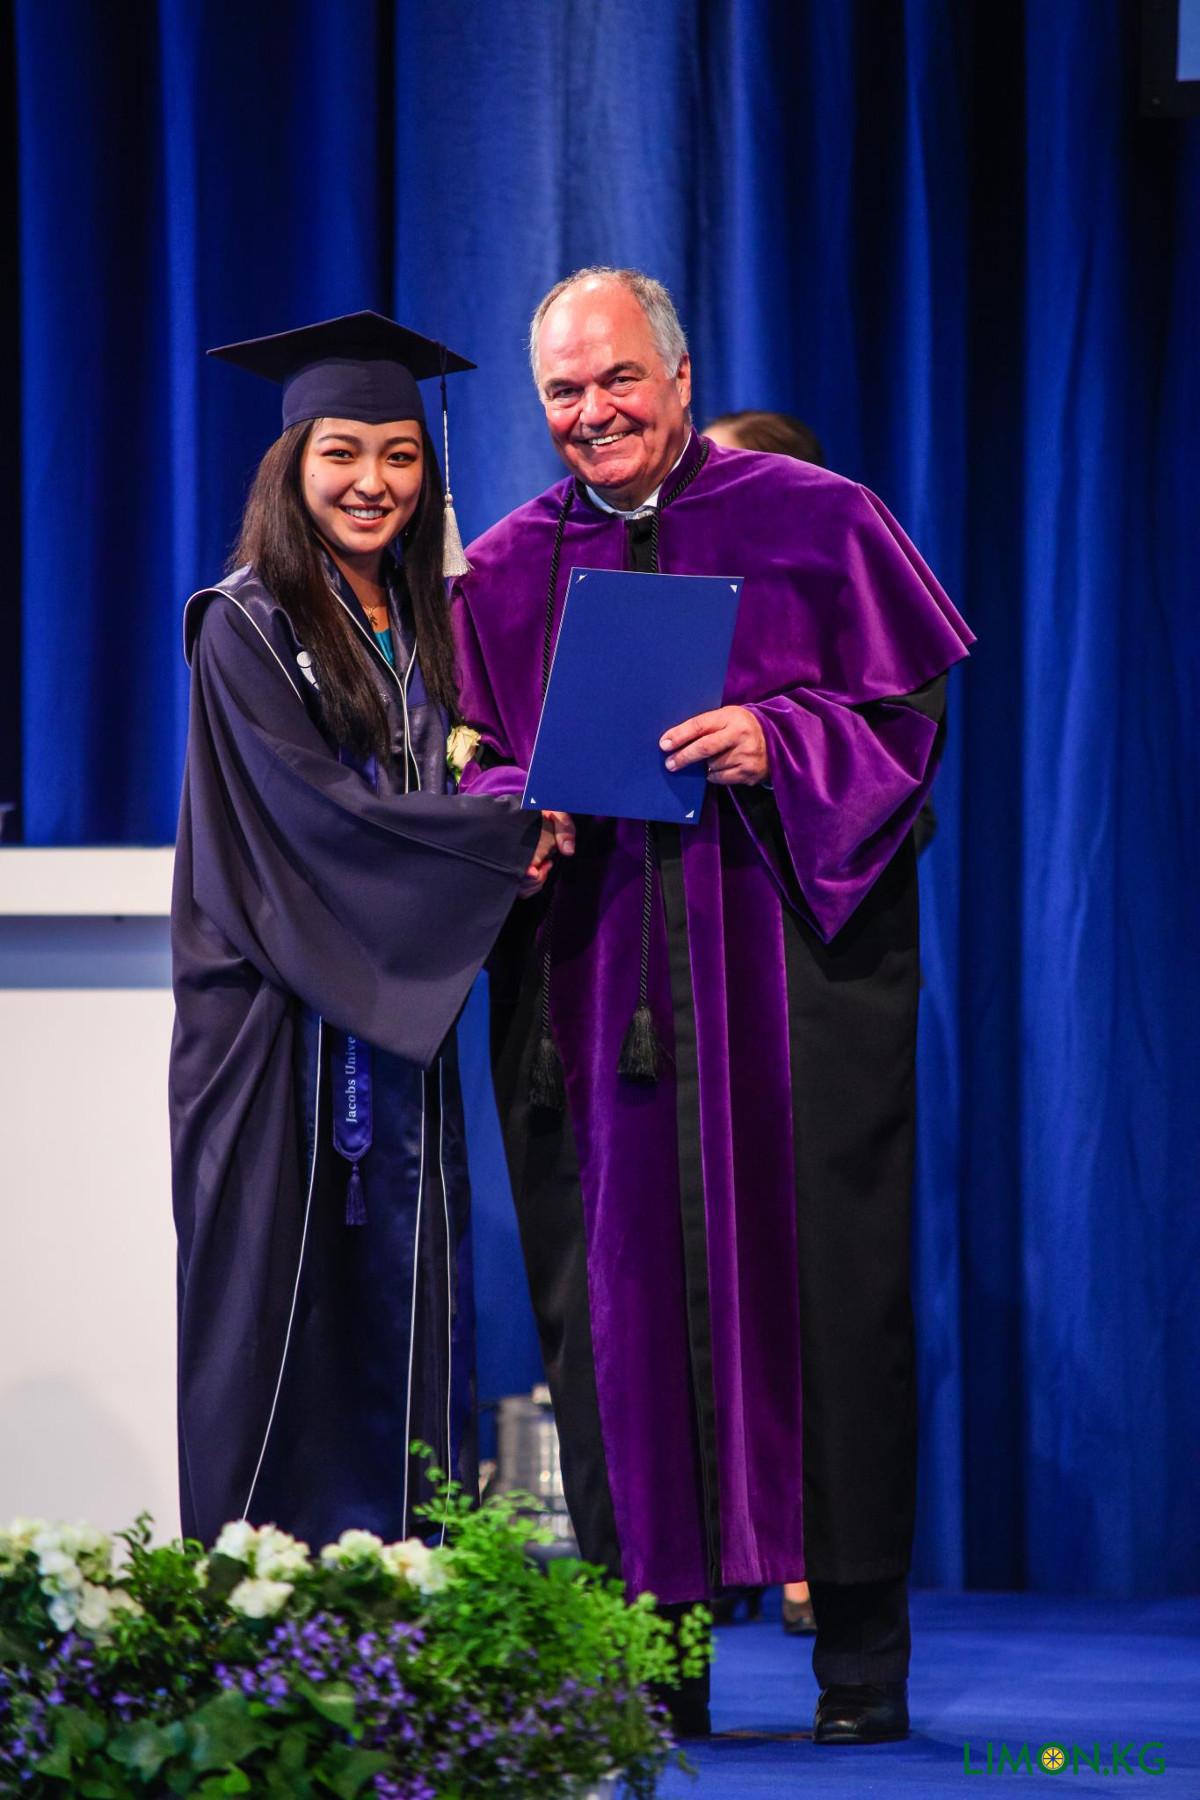 jub graduation